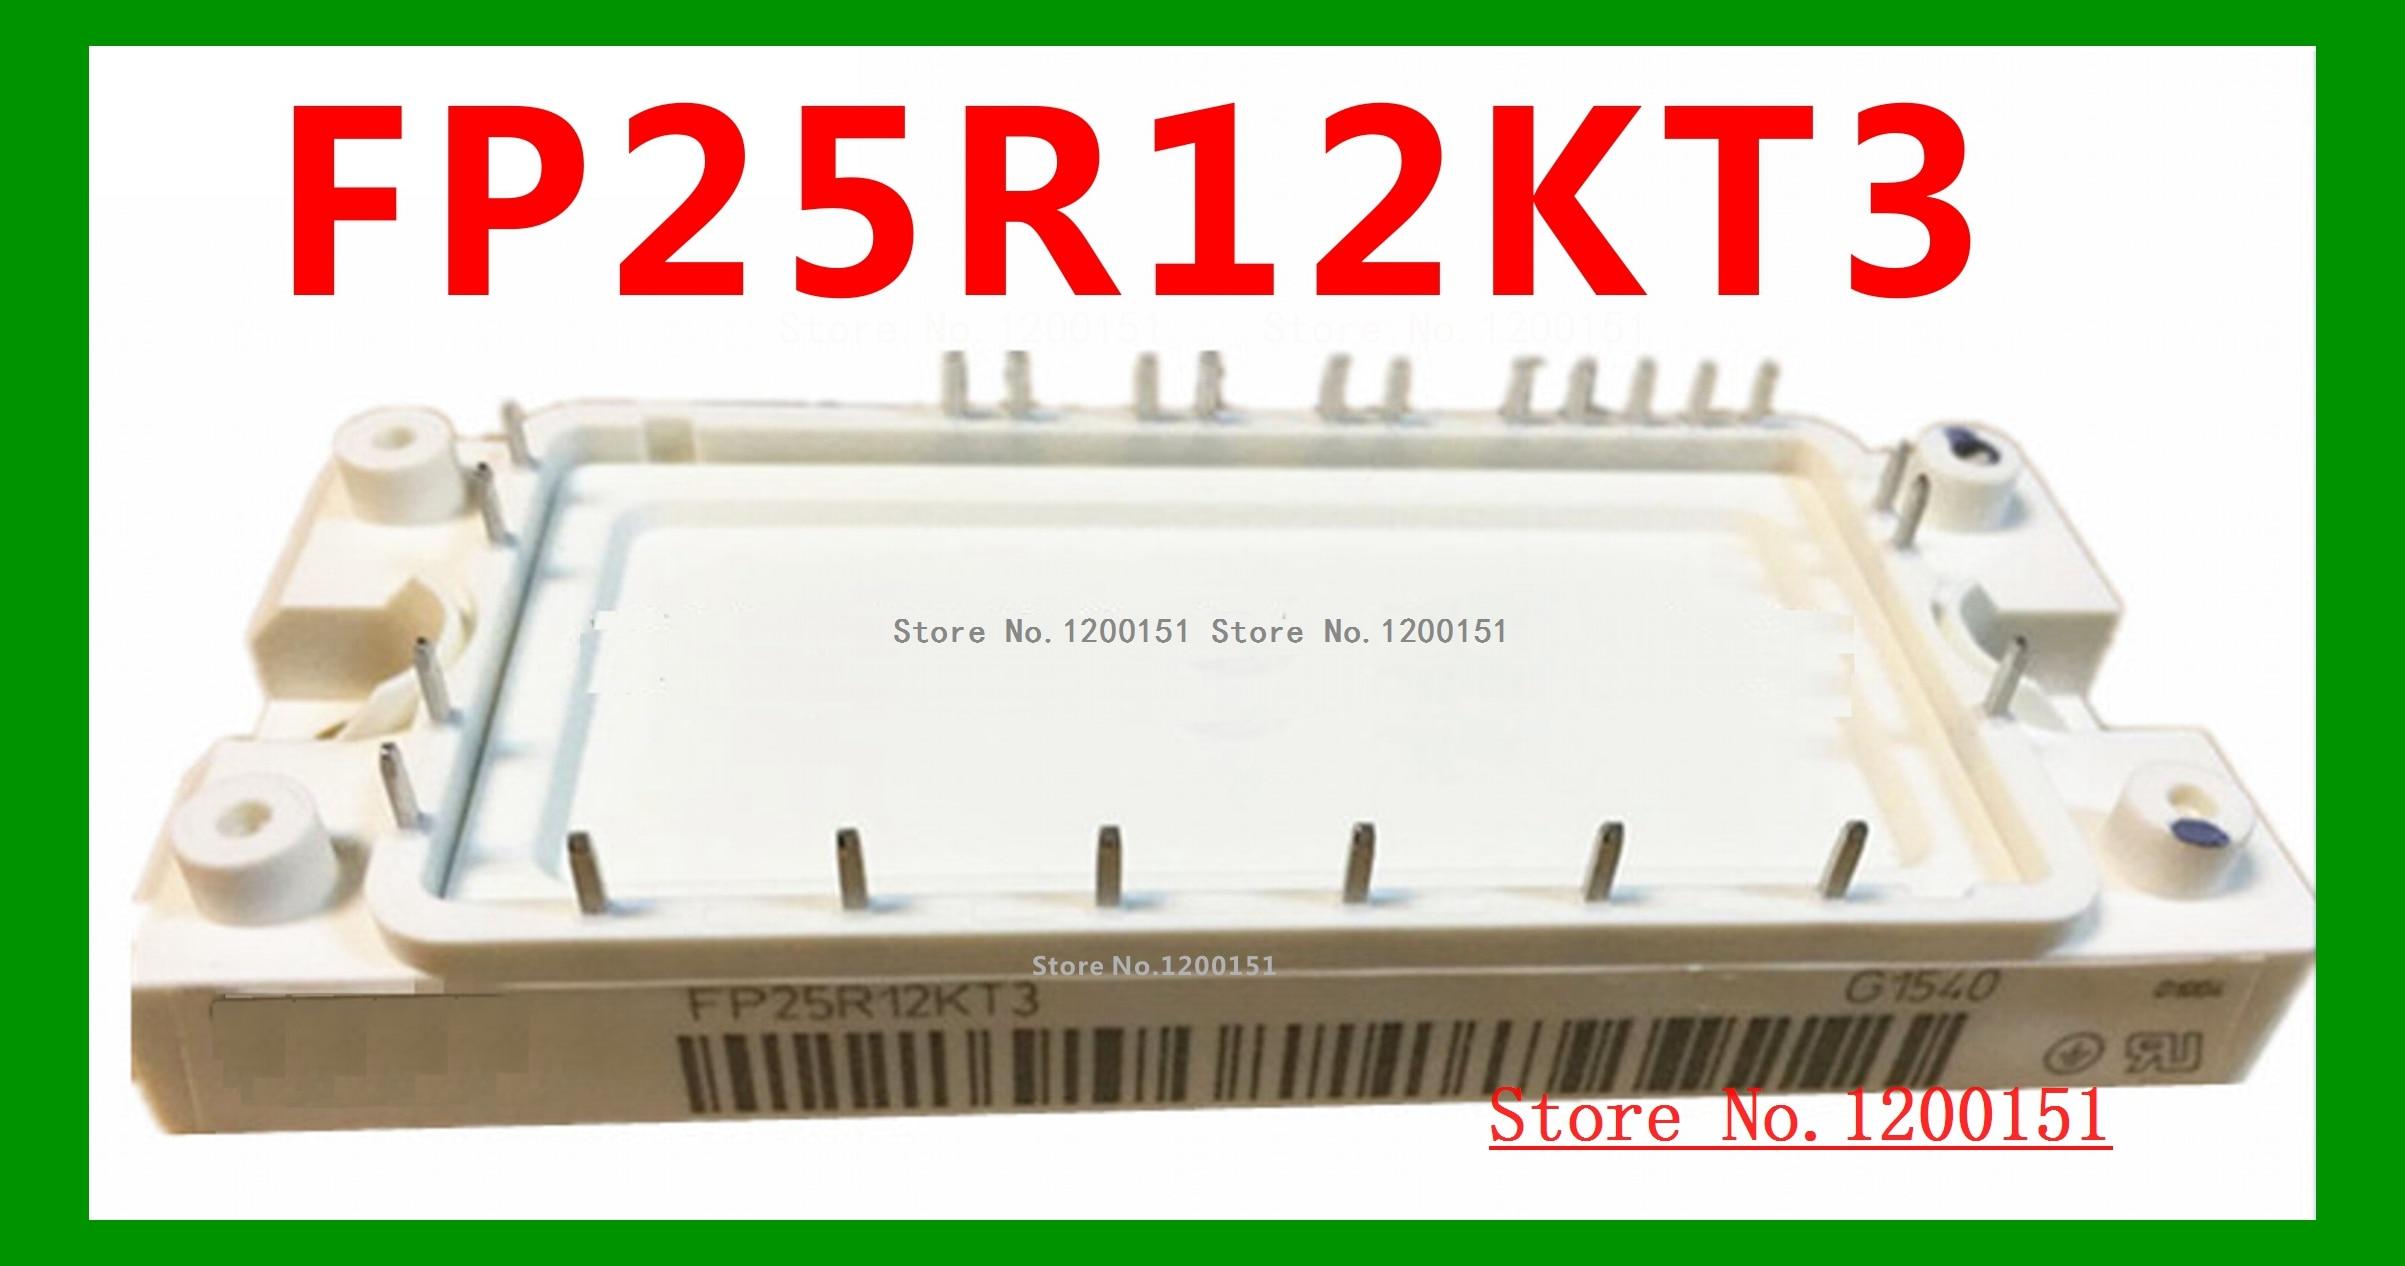 FP25R12KT3 FP25R12KT4 FP35R12KT4 FP50R12KT4 MODULES